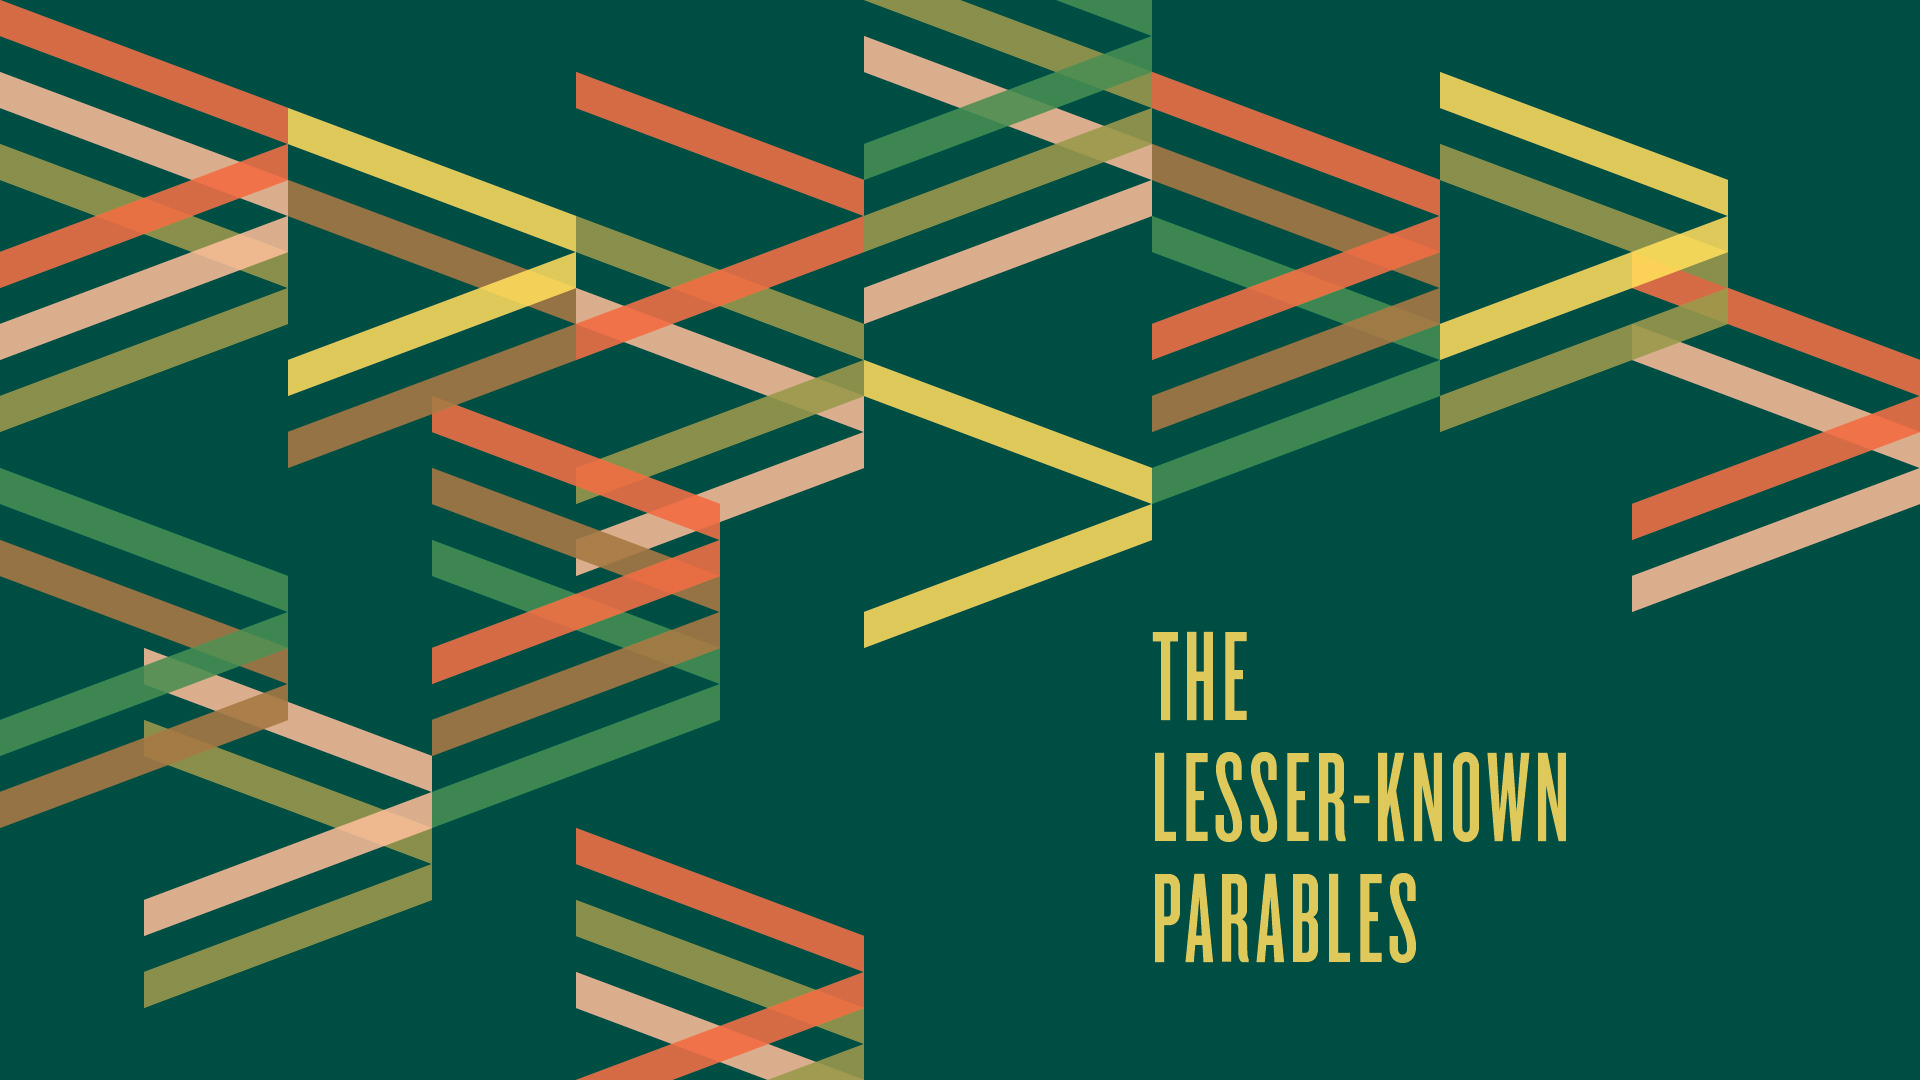 TheLesserKnownParables_web.jpg